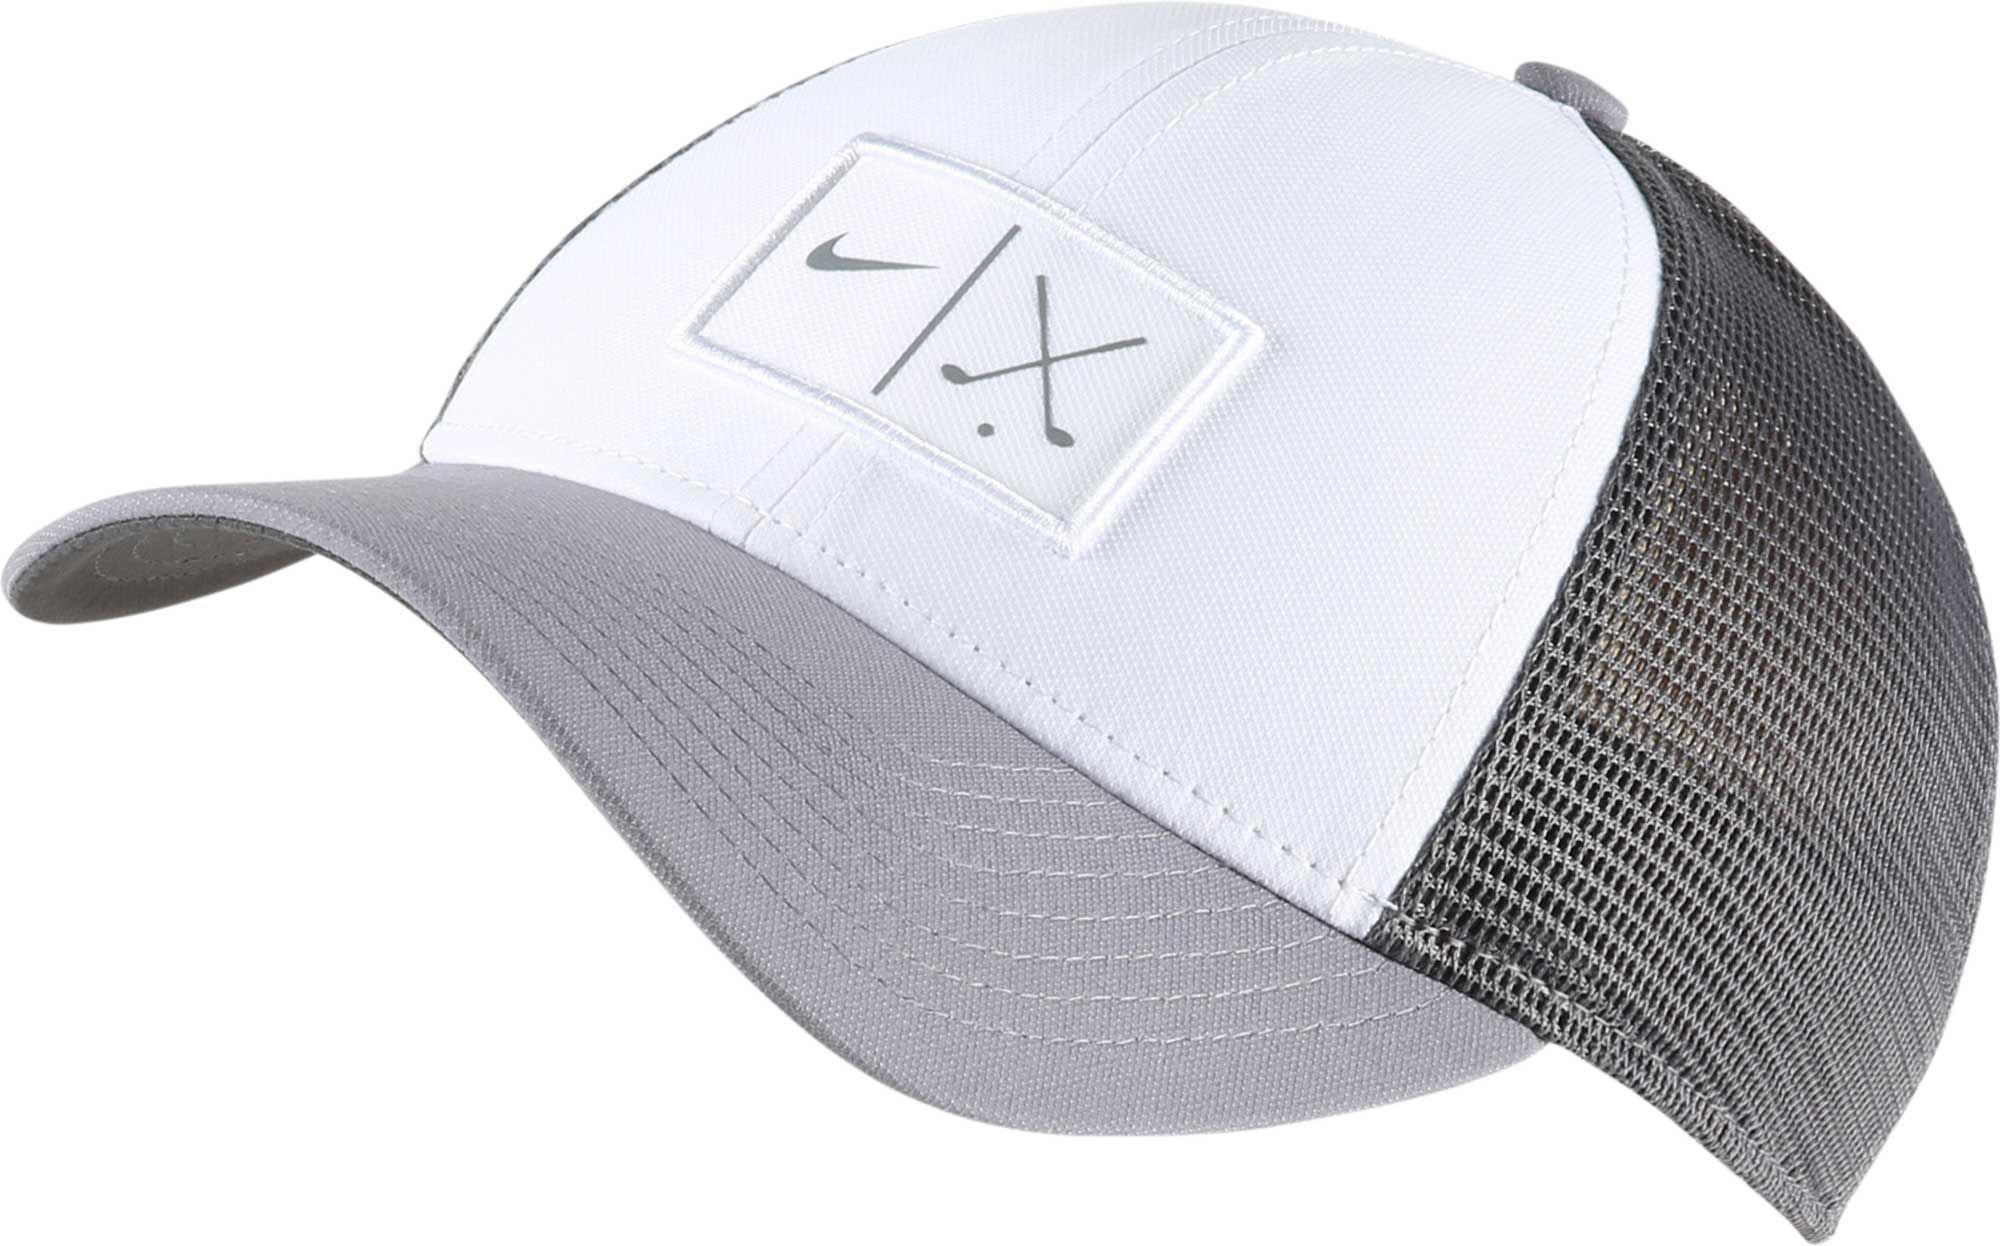 best sneakers 966da 54493 Nike Mesh Golf Hat in Gray for Men - Lyst